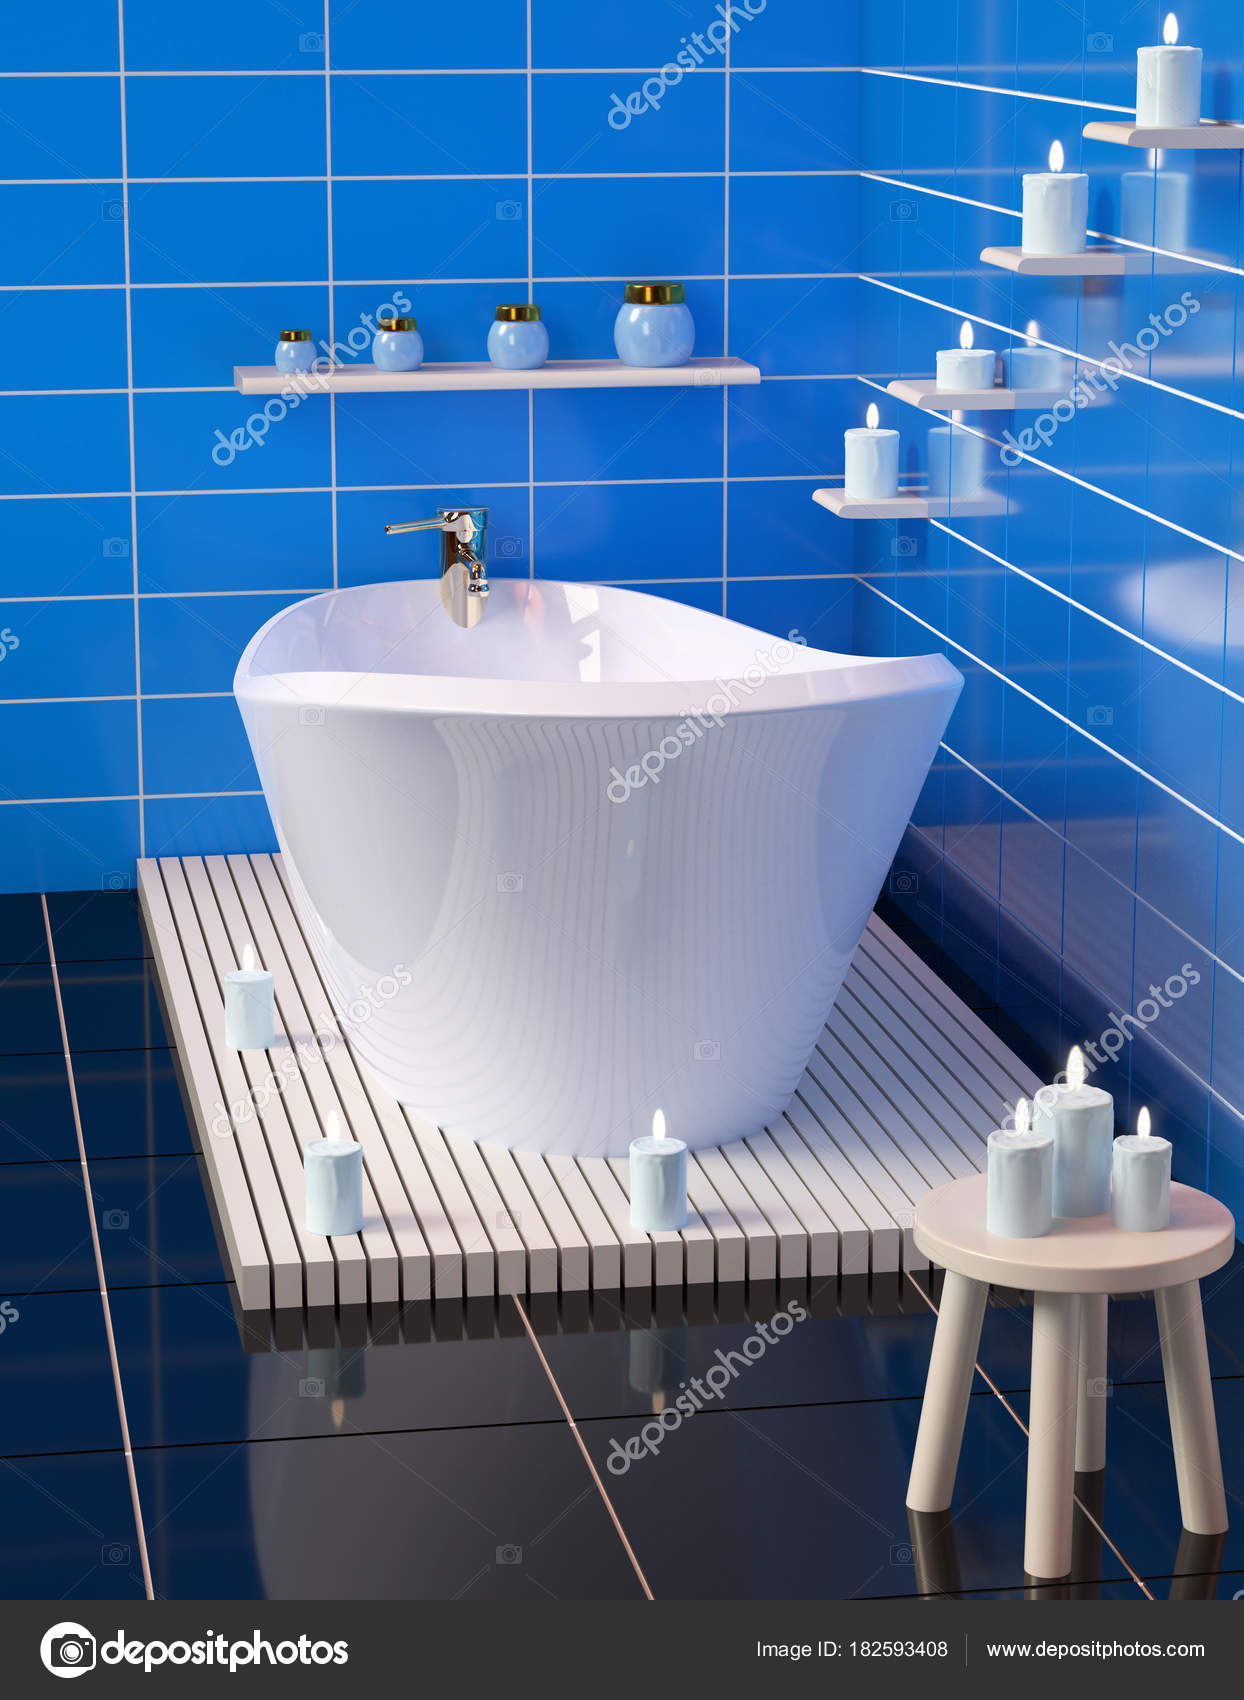 Fein badezimmer badewanne ideen heimat ideen - Glastrennwand fur dusche ...